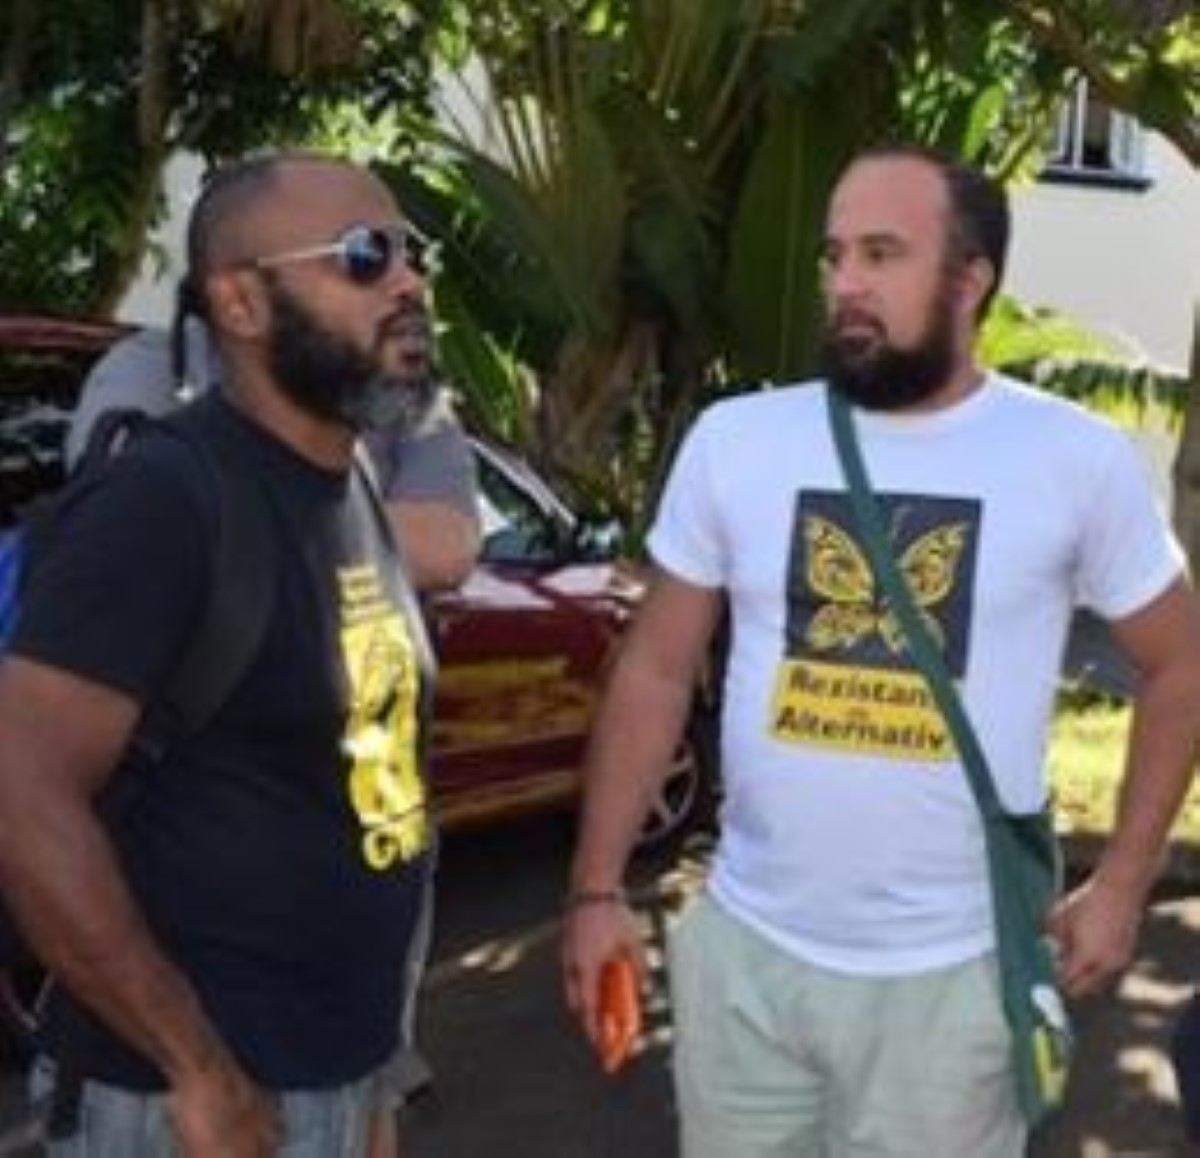 Pomponette : Aucune charge retenue contre David Sauvage